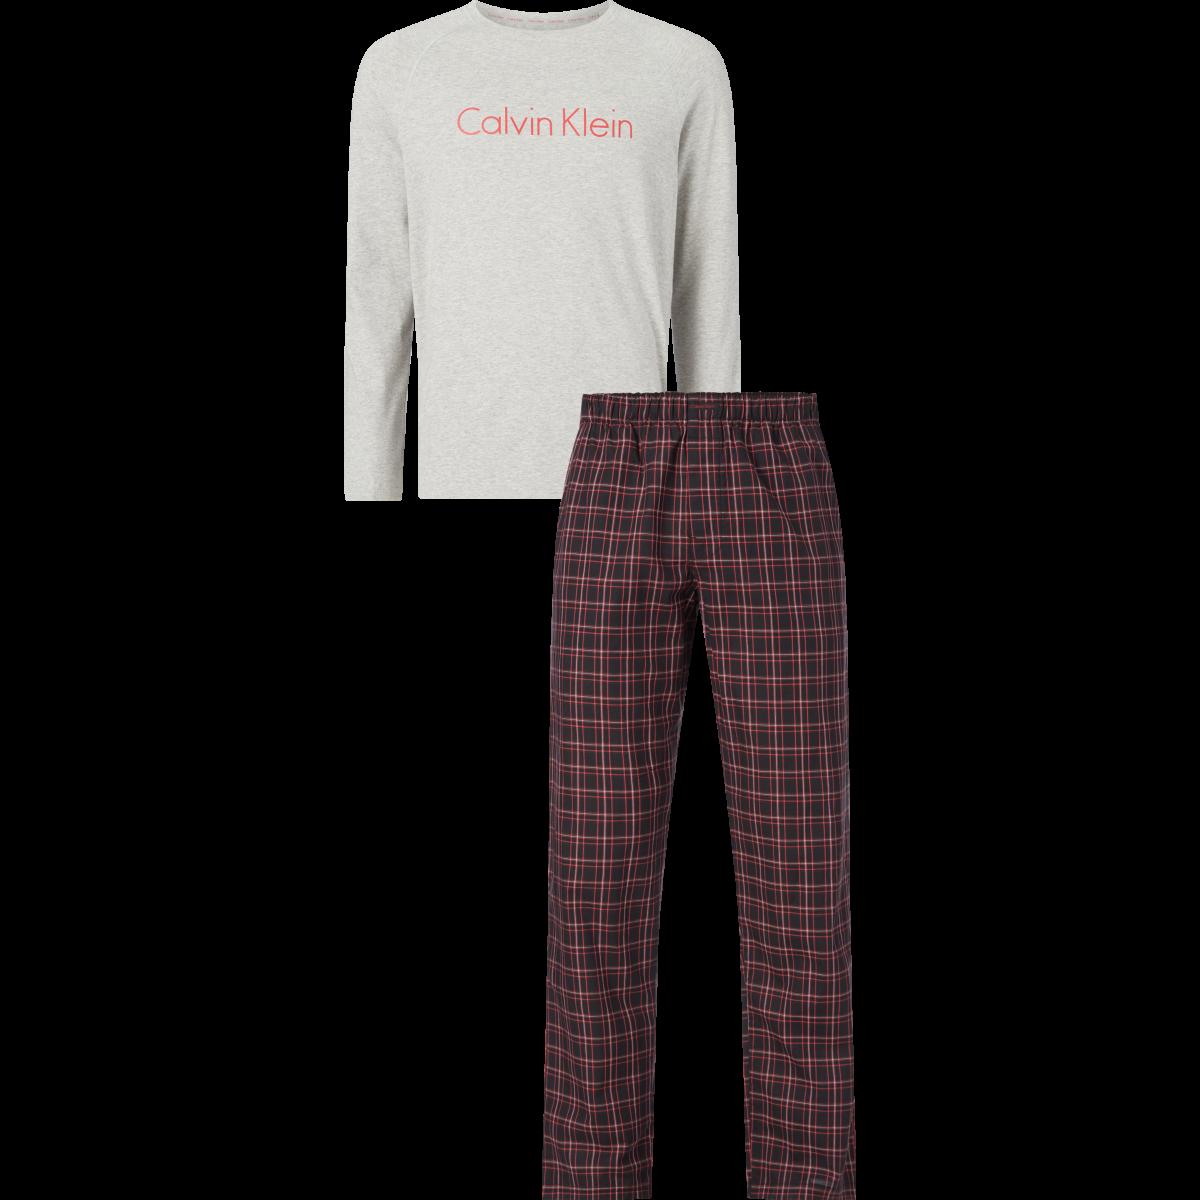 Pyjama - 3 suisses - Modalova